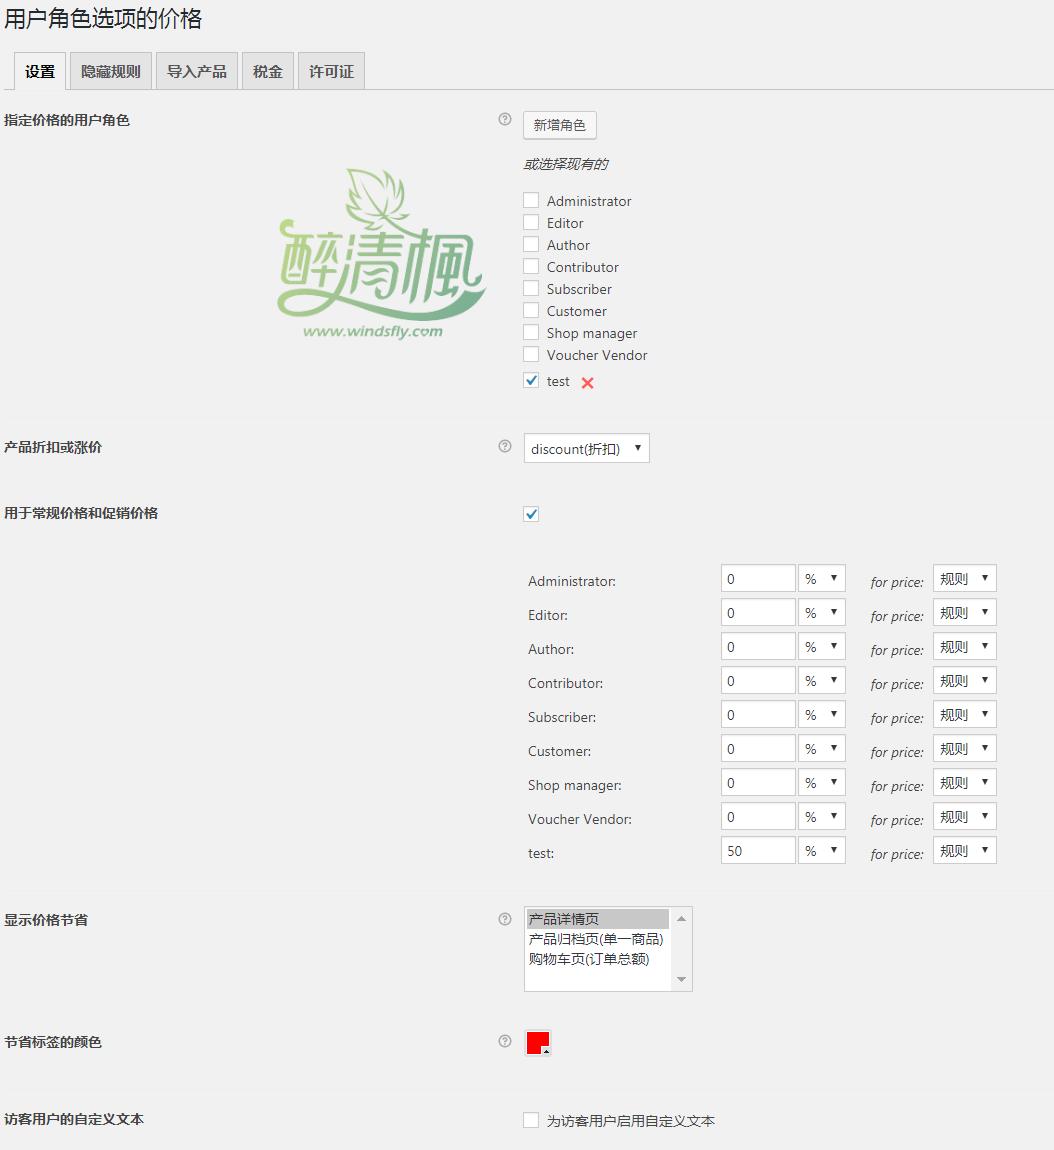 Woocommerce角色定价插件 - Prices By User Role(汉化)[更新至v5.0.1] WooCommerce插件 第2张